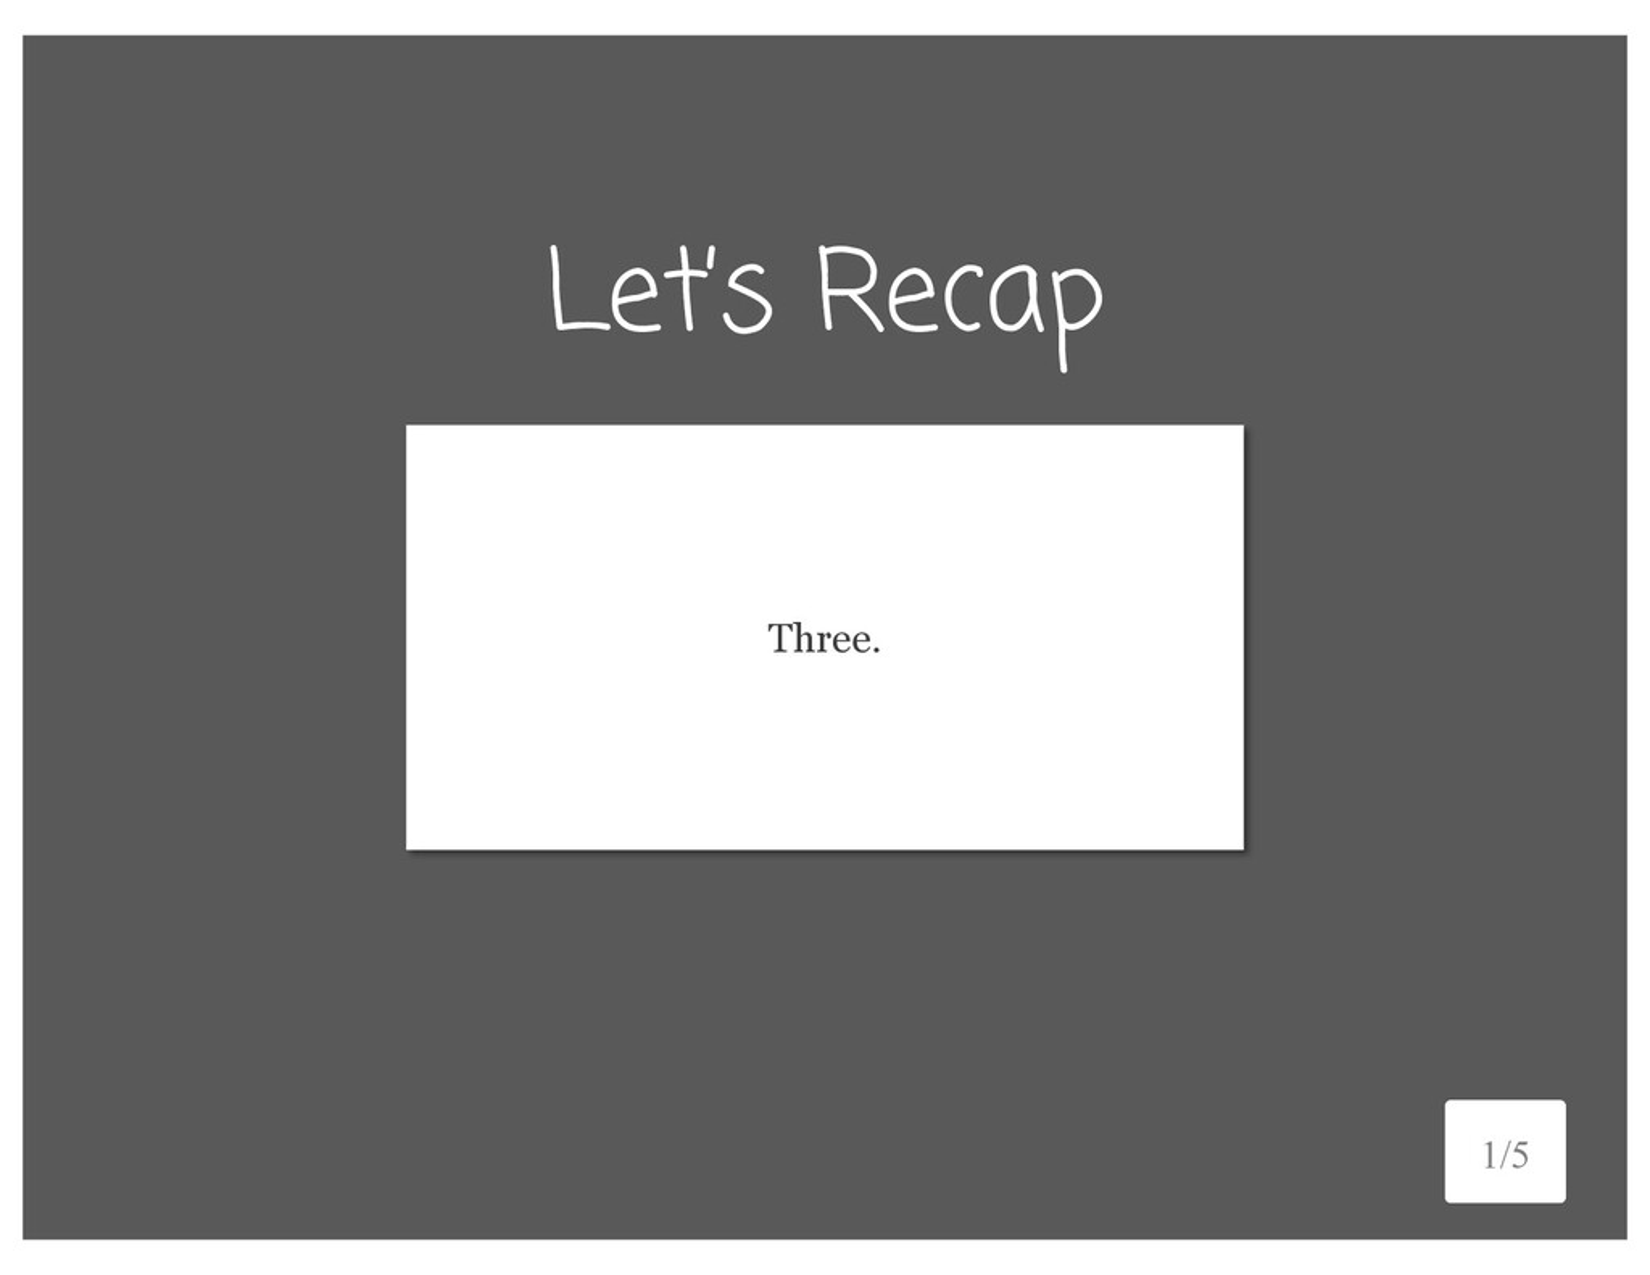 Let's Recap Name three ways to add padding. 4/5